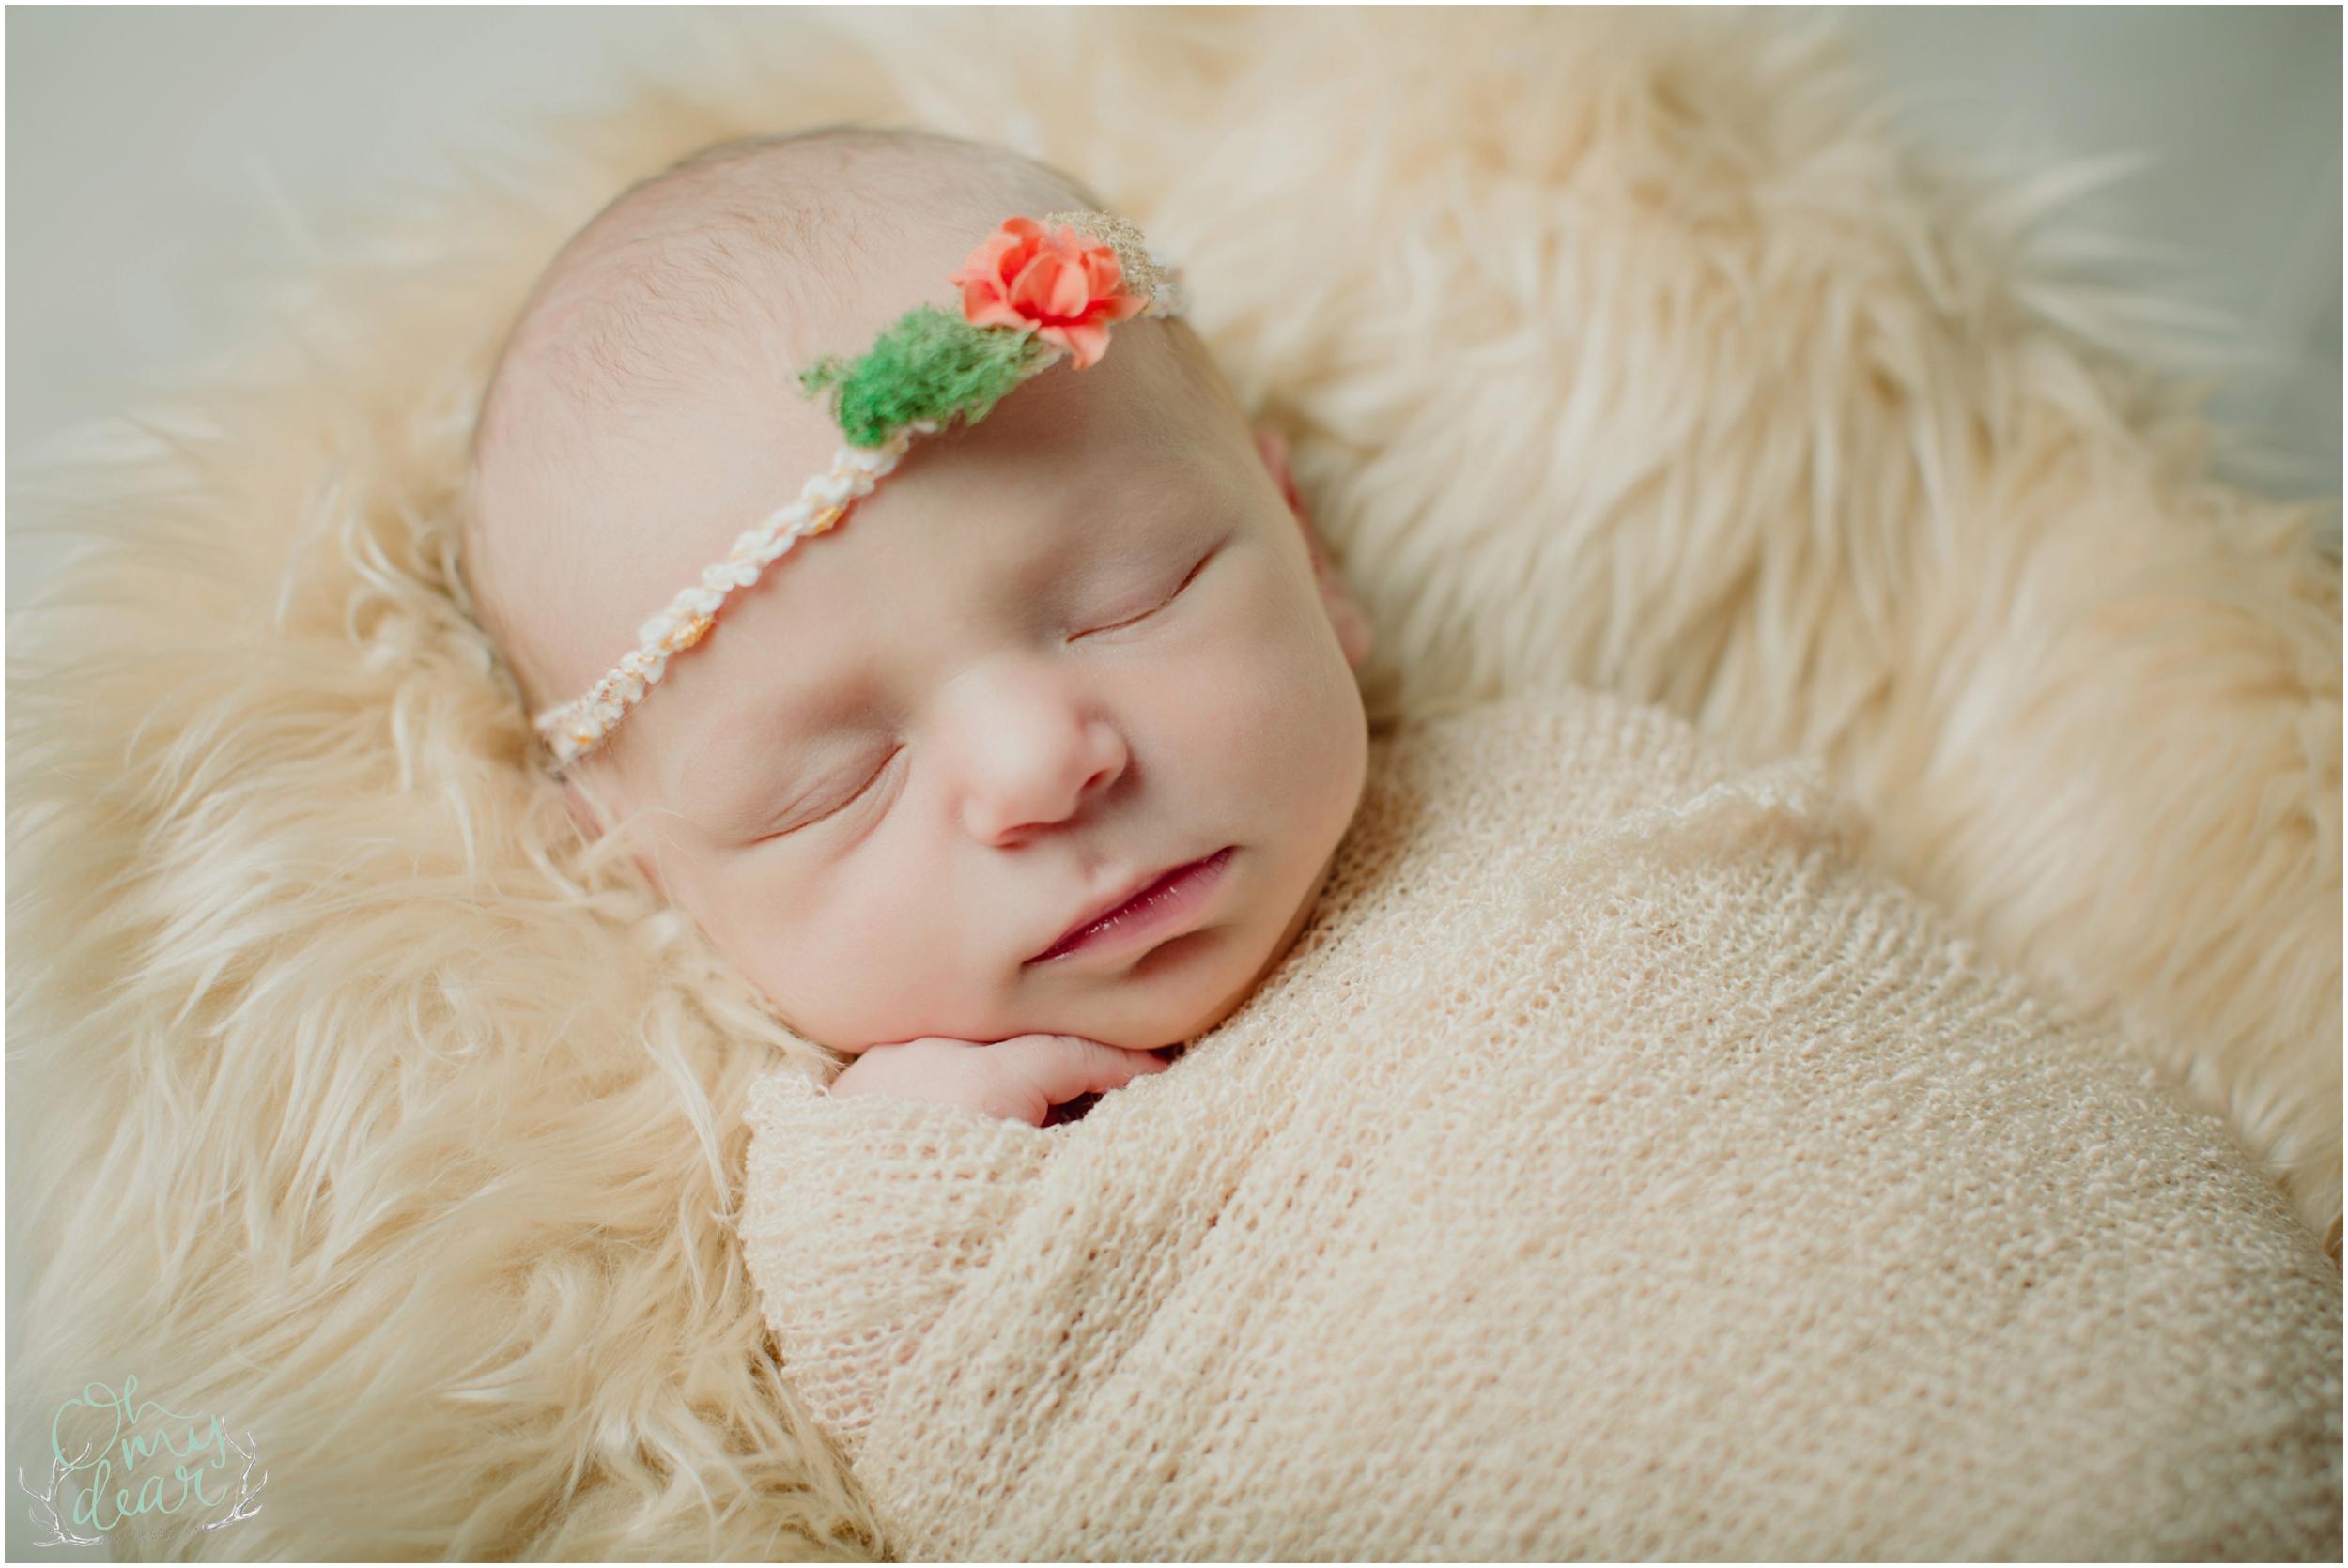 NewbornPhotographyMooreOklahoma.jpg